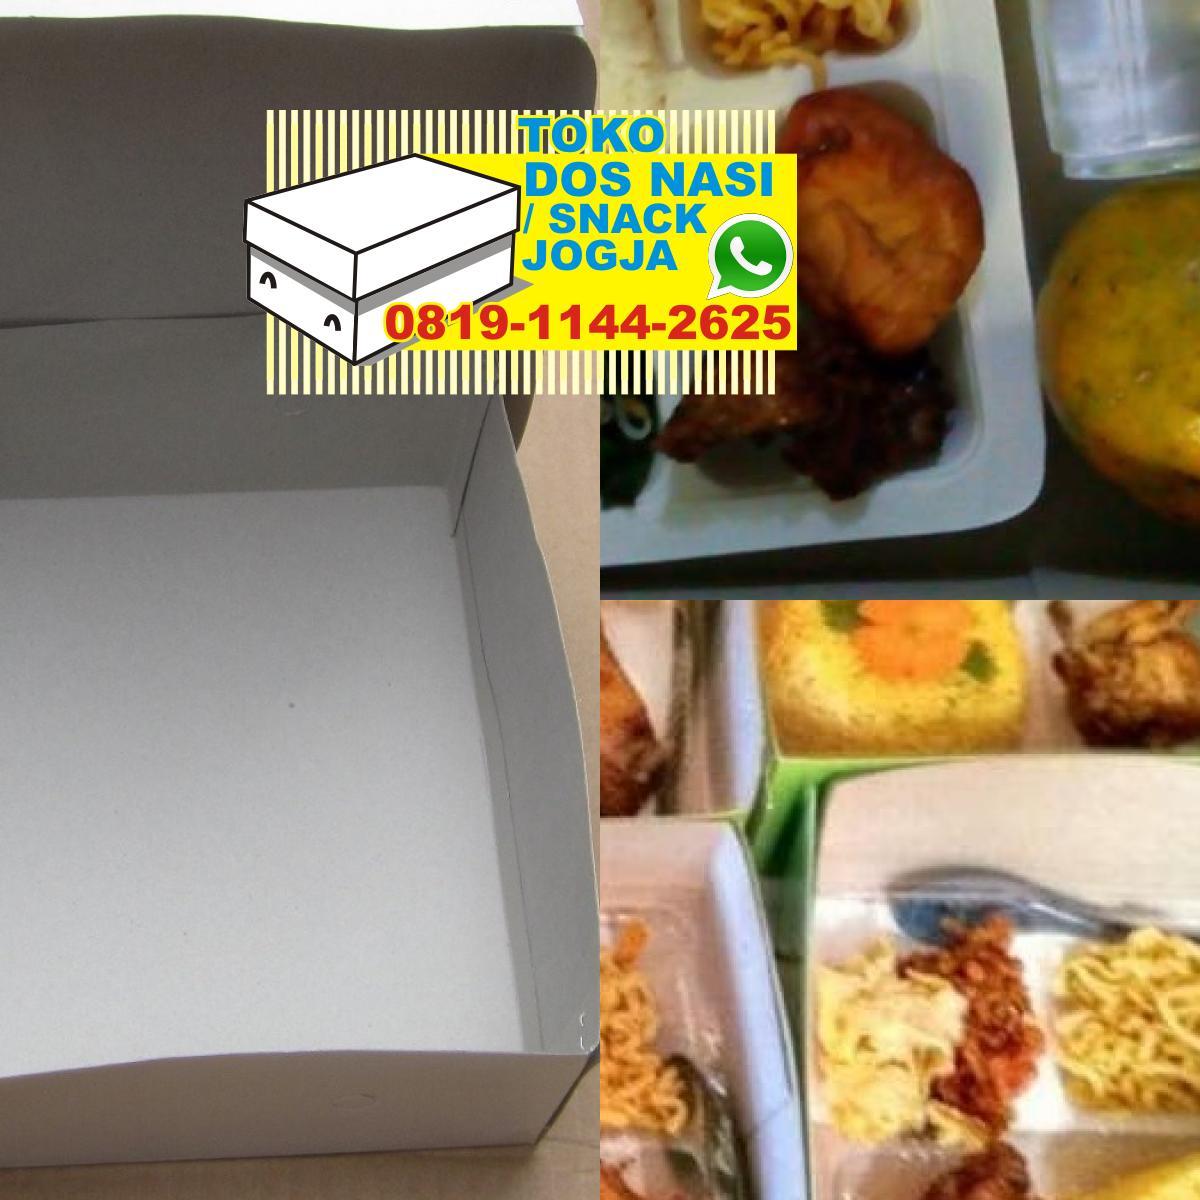 Snack Kotak Jogja - O8I9 II44 2625 (WA) cetak kotak nasi ...